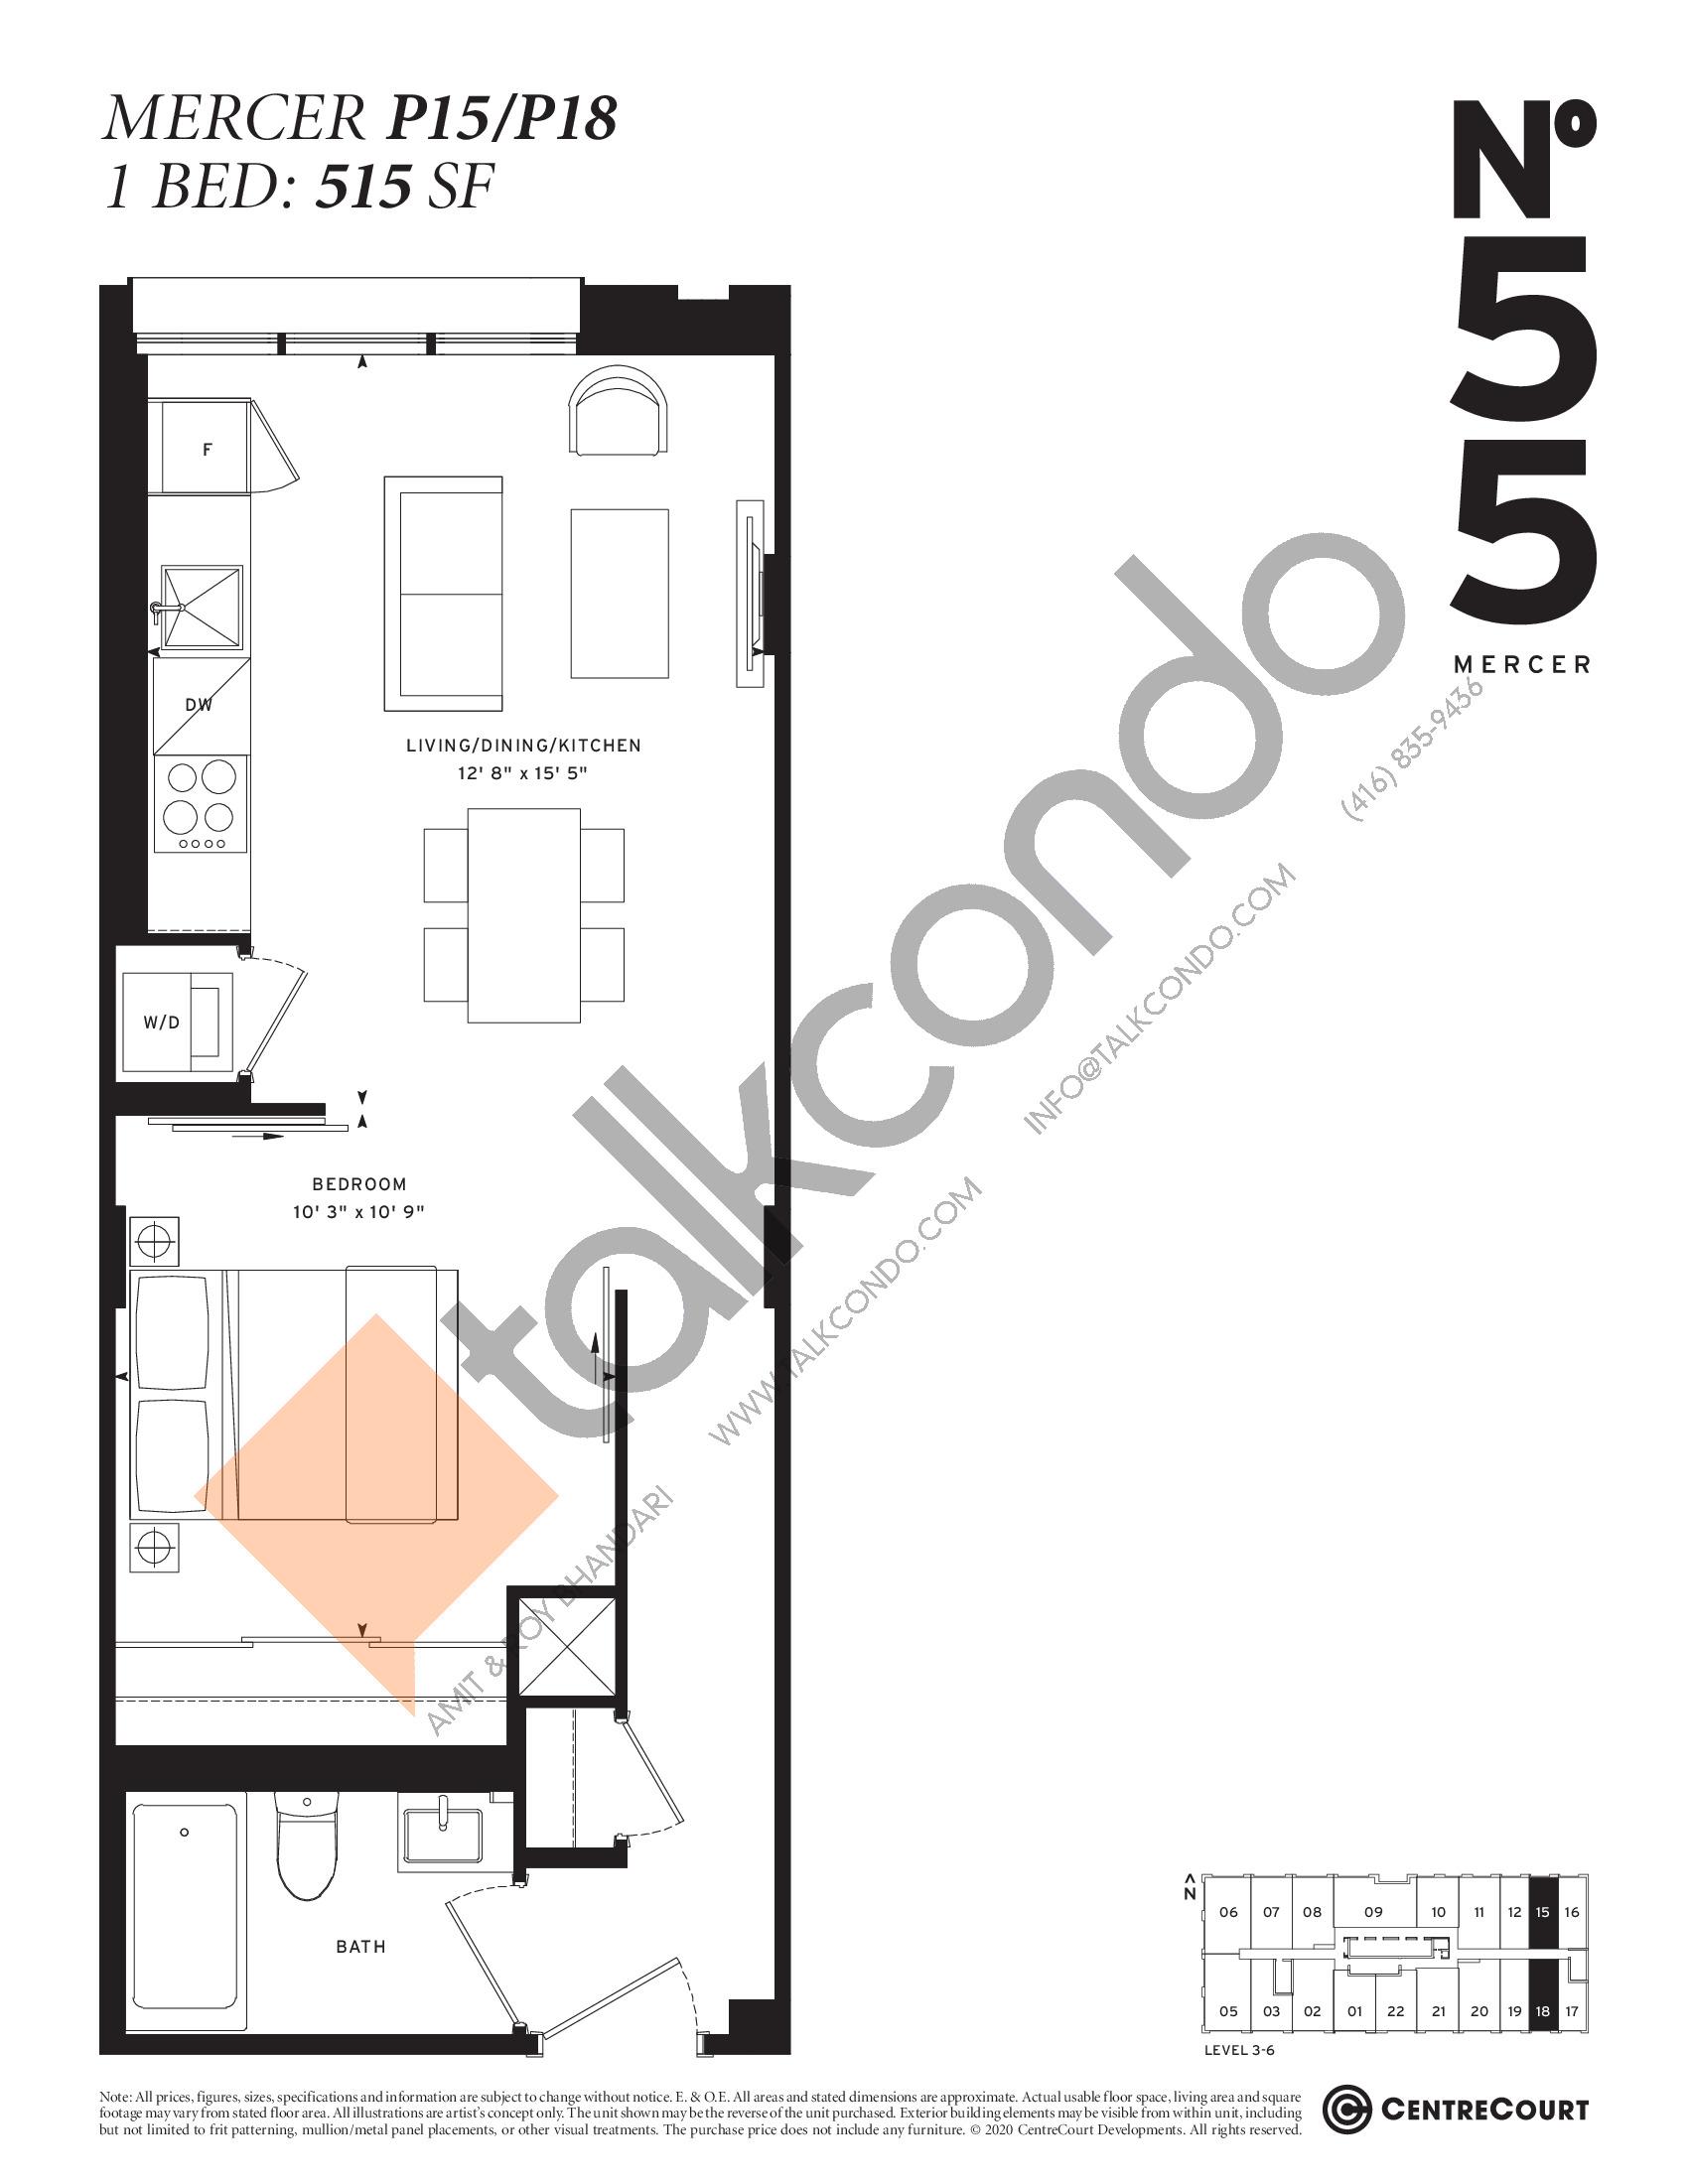 Mercer P15/P18 Floor Plan at No. 55 Mercer Condos - 515 sq.ft